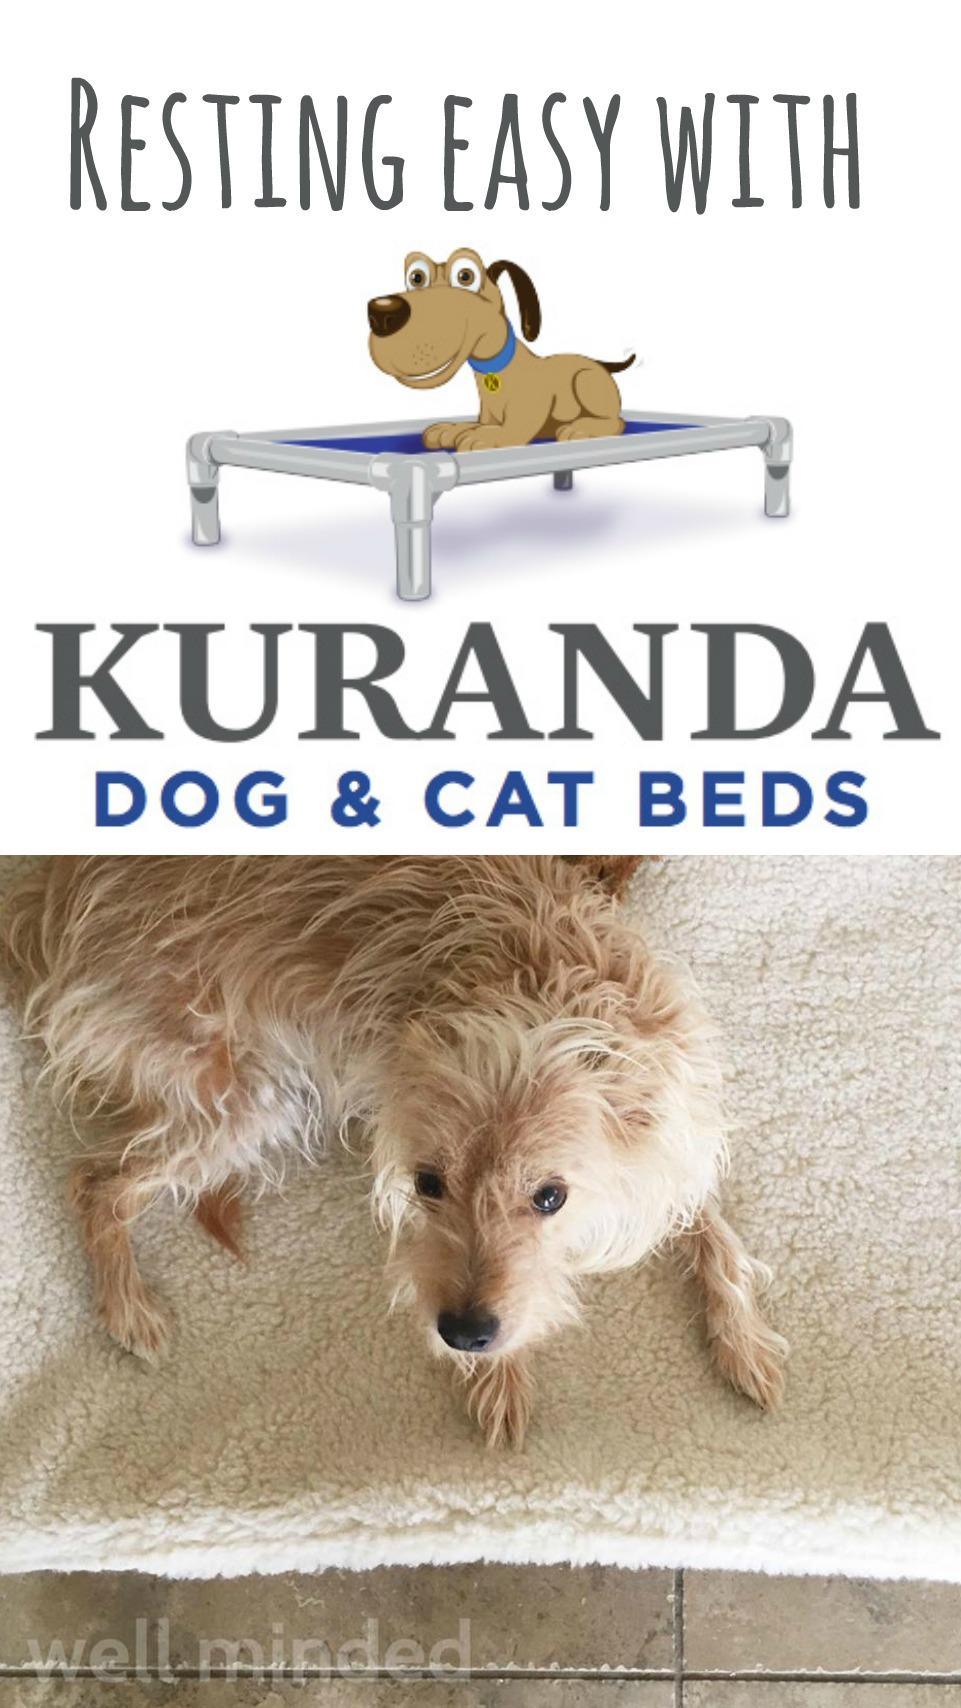 Resting_Easy_Kuranda_Dog_and_Cat_Beds